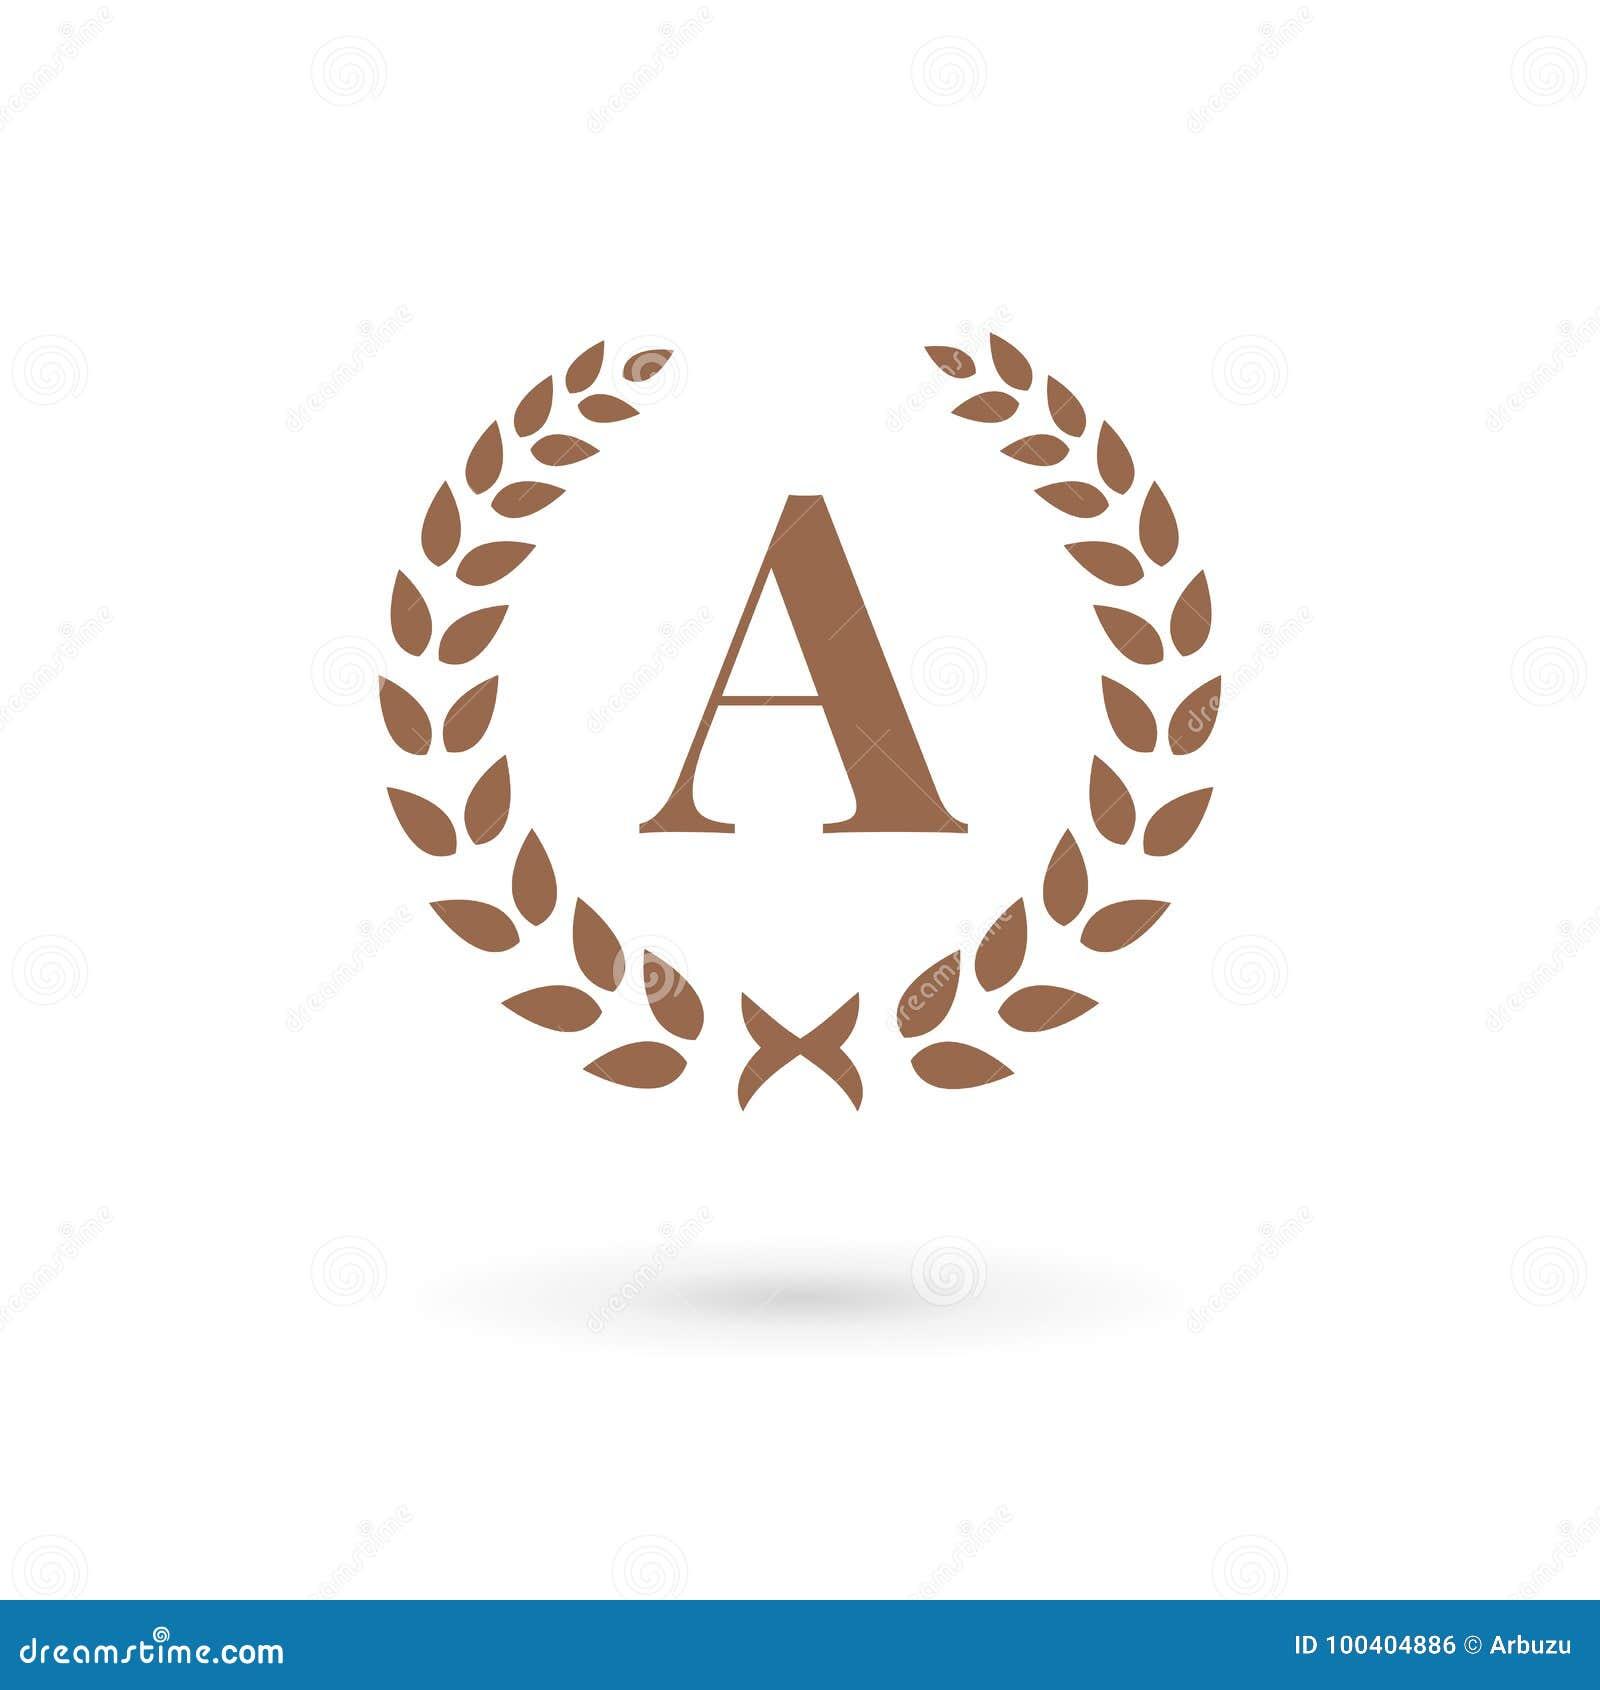 e43470f0 Letter A Laurel Wreath Logo Icon Design Template Elements Stock ...